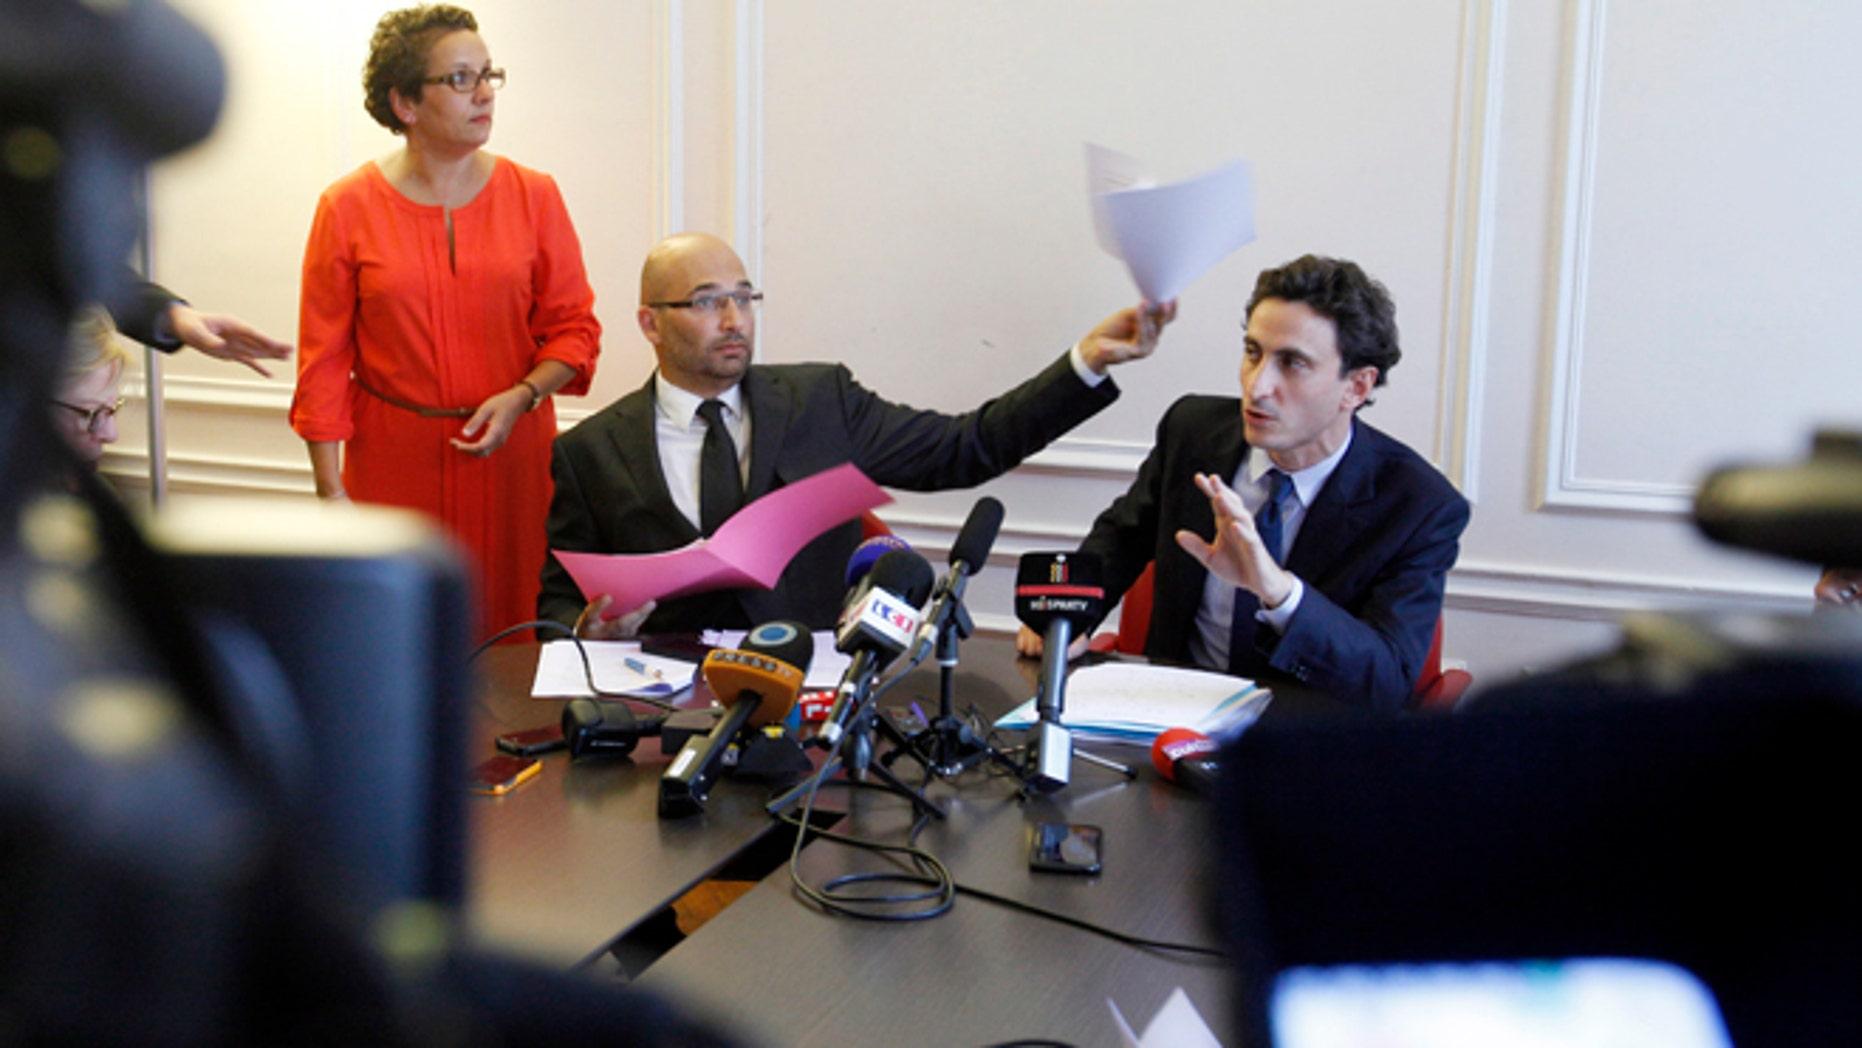 Oct. 2, 2013: Lawyers acting for the plaintiff, Slim ben Achour, left, and Felix de Belloy talk during a press conference in Paris.